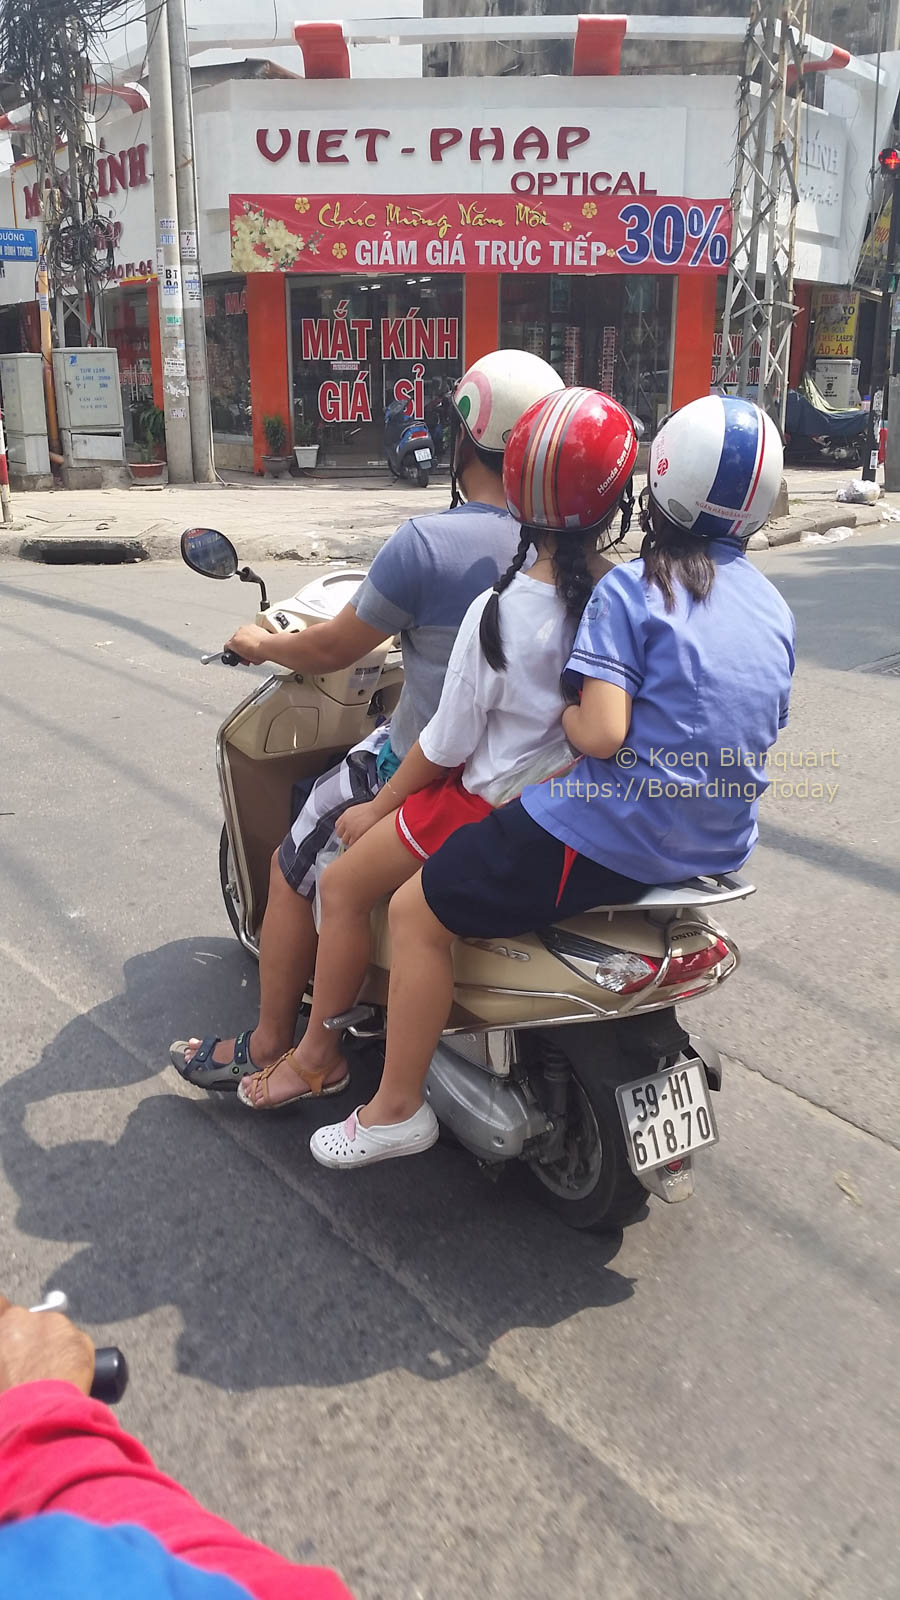 20170120-2017-01-20 12.04.21-2Ho Chi Minh City, Saigon, Vietnam by Koen Blanquart for Boarding.Today.jpg